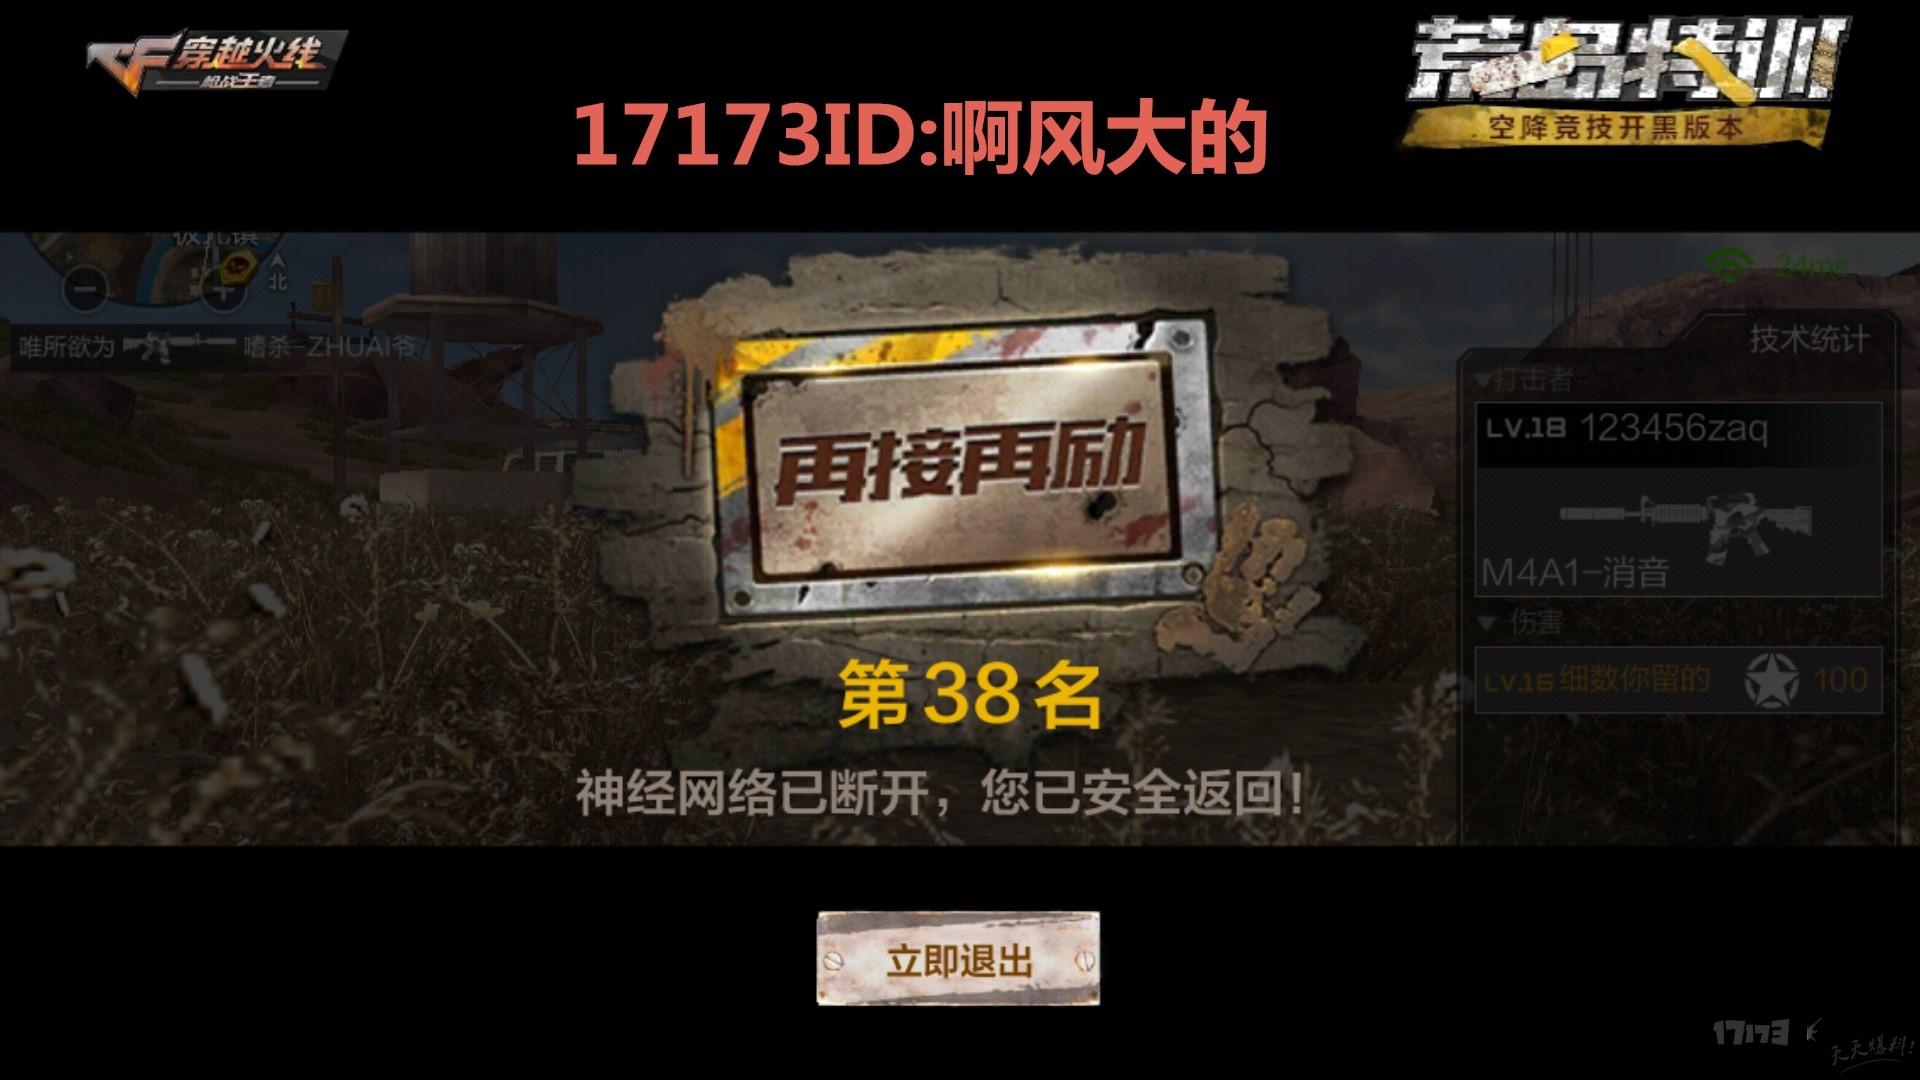 Screenshot_2017-12-01-18-54-23-789_com.tencent.tm_副本.jpg